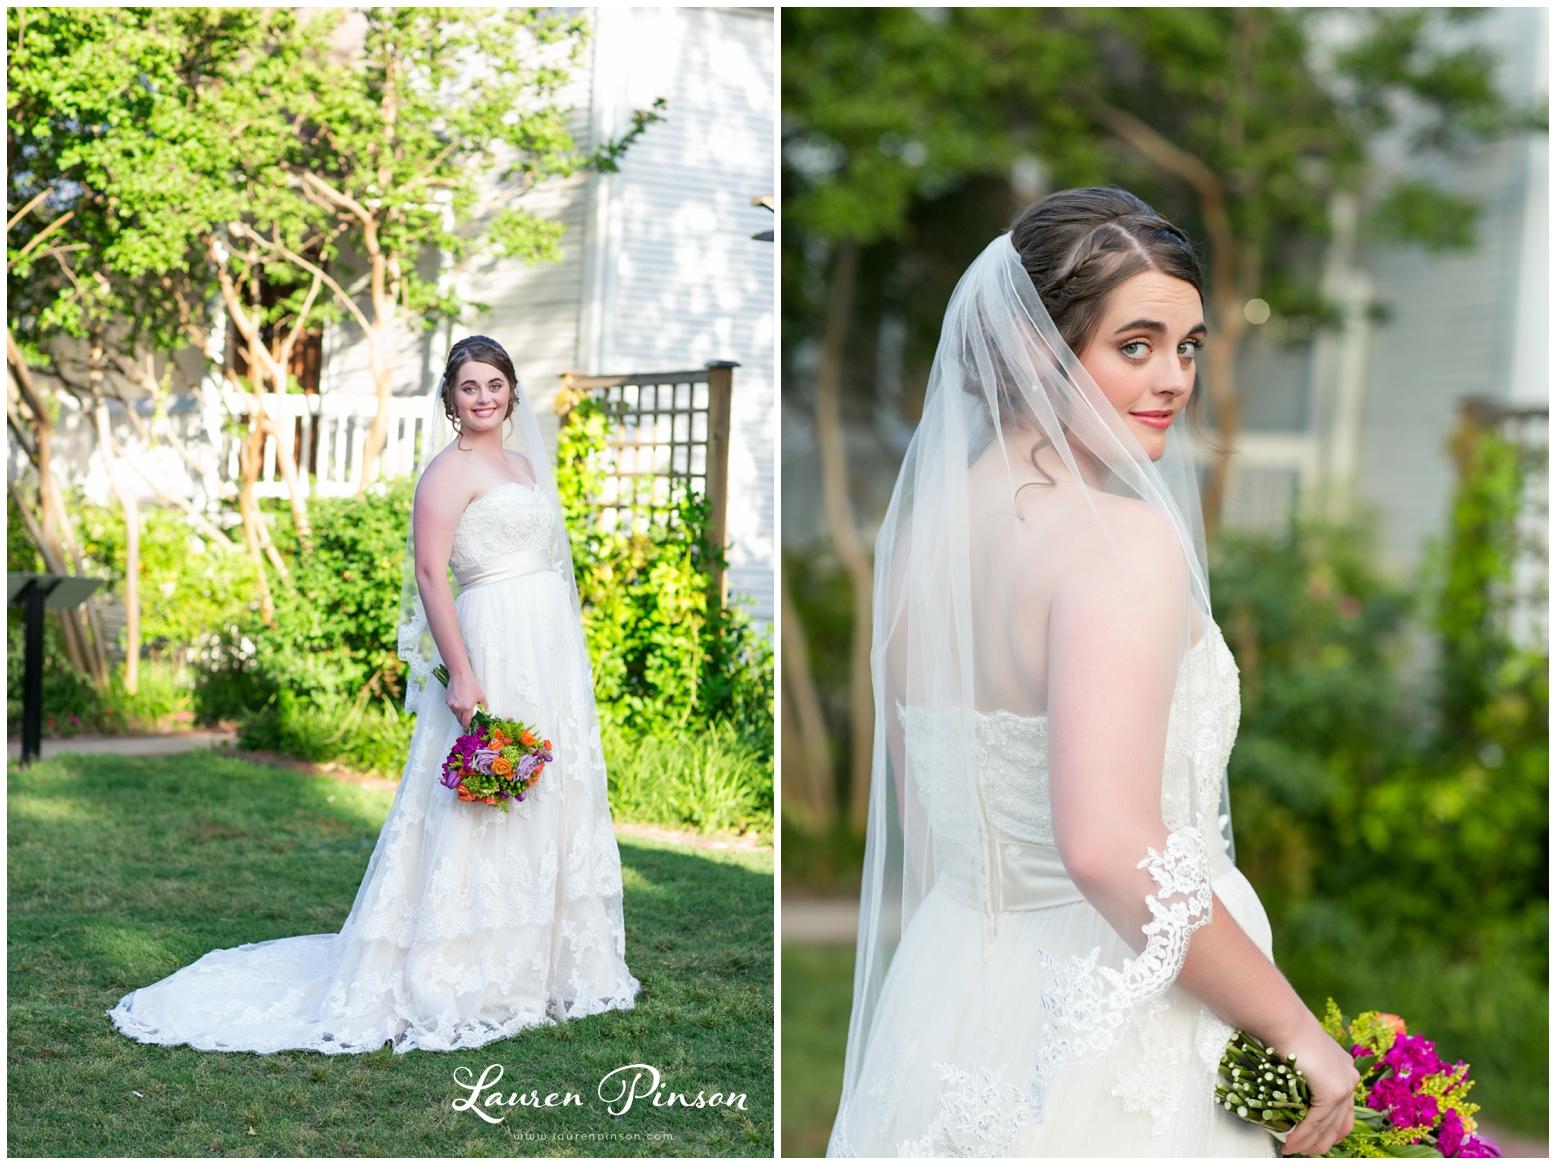 chestnut-square-downtown-mckinney-texas-wedding-photographer-sherman-northtexas-bridal-portraits-photography_0216.jpg